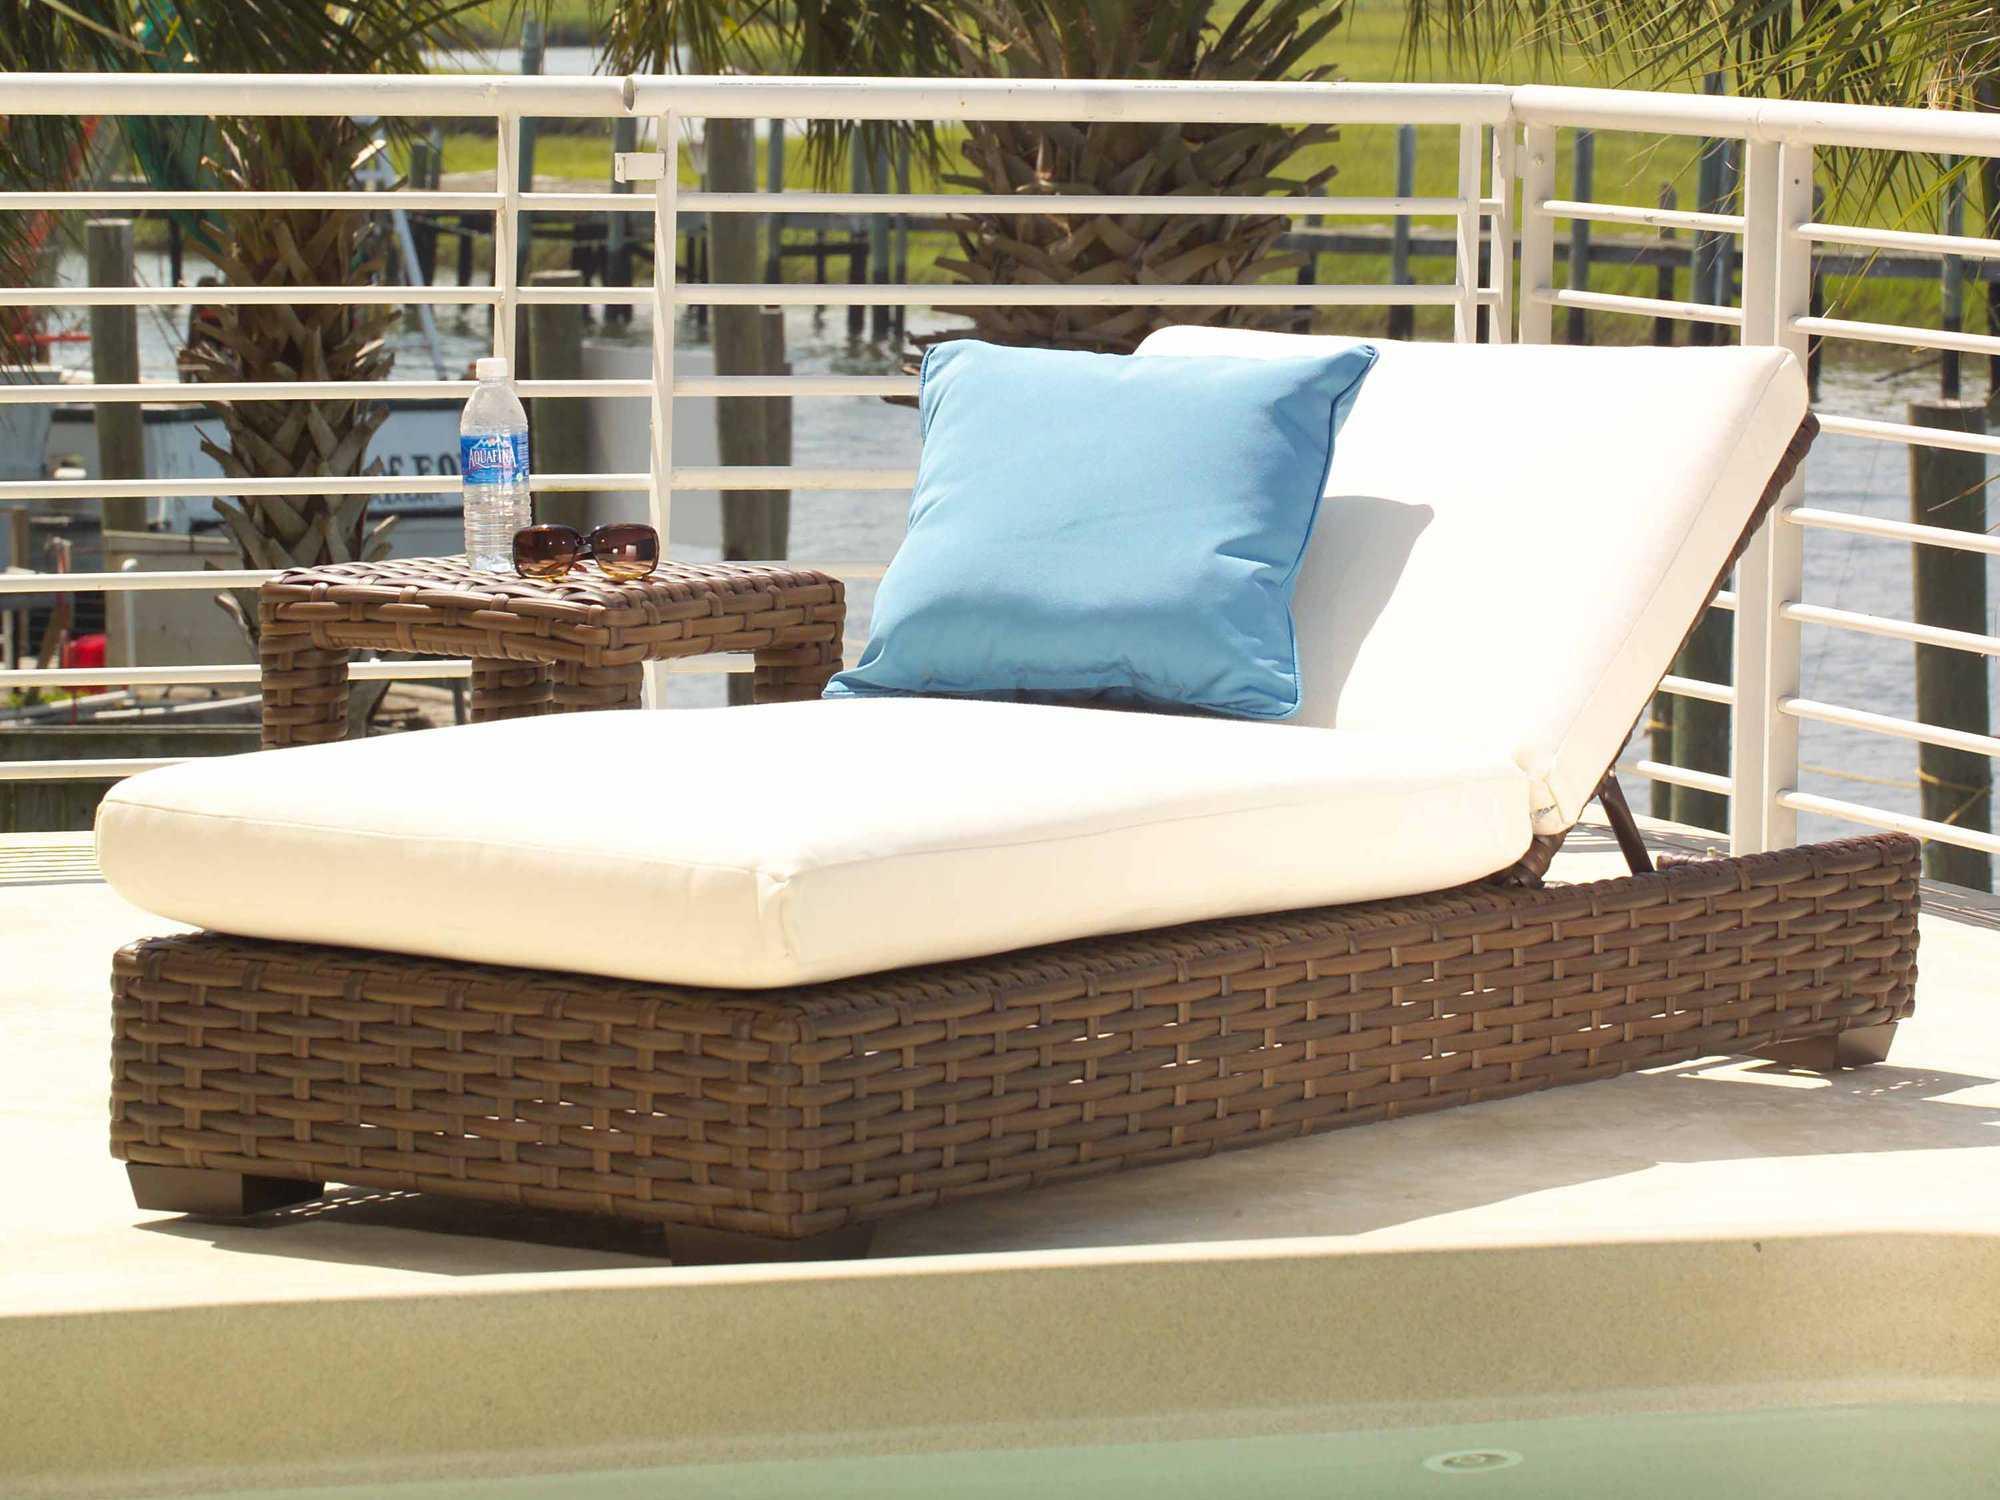 lloyd flanders contempo wicker pool chaise lounge - Lloyd Flanders